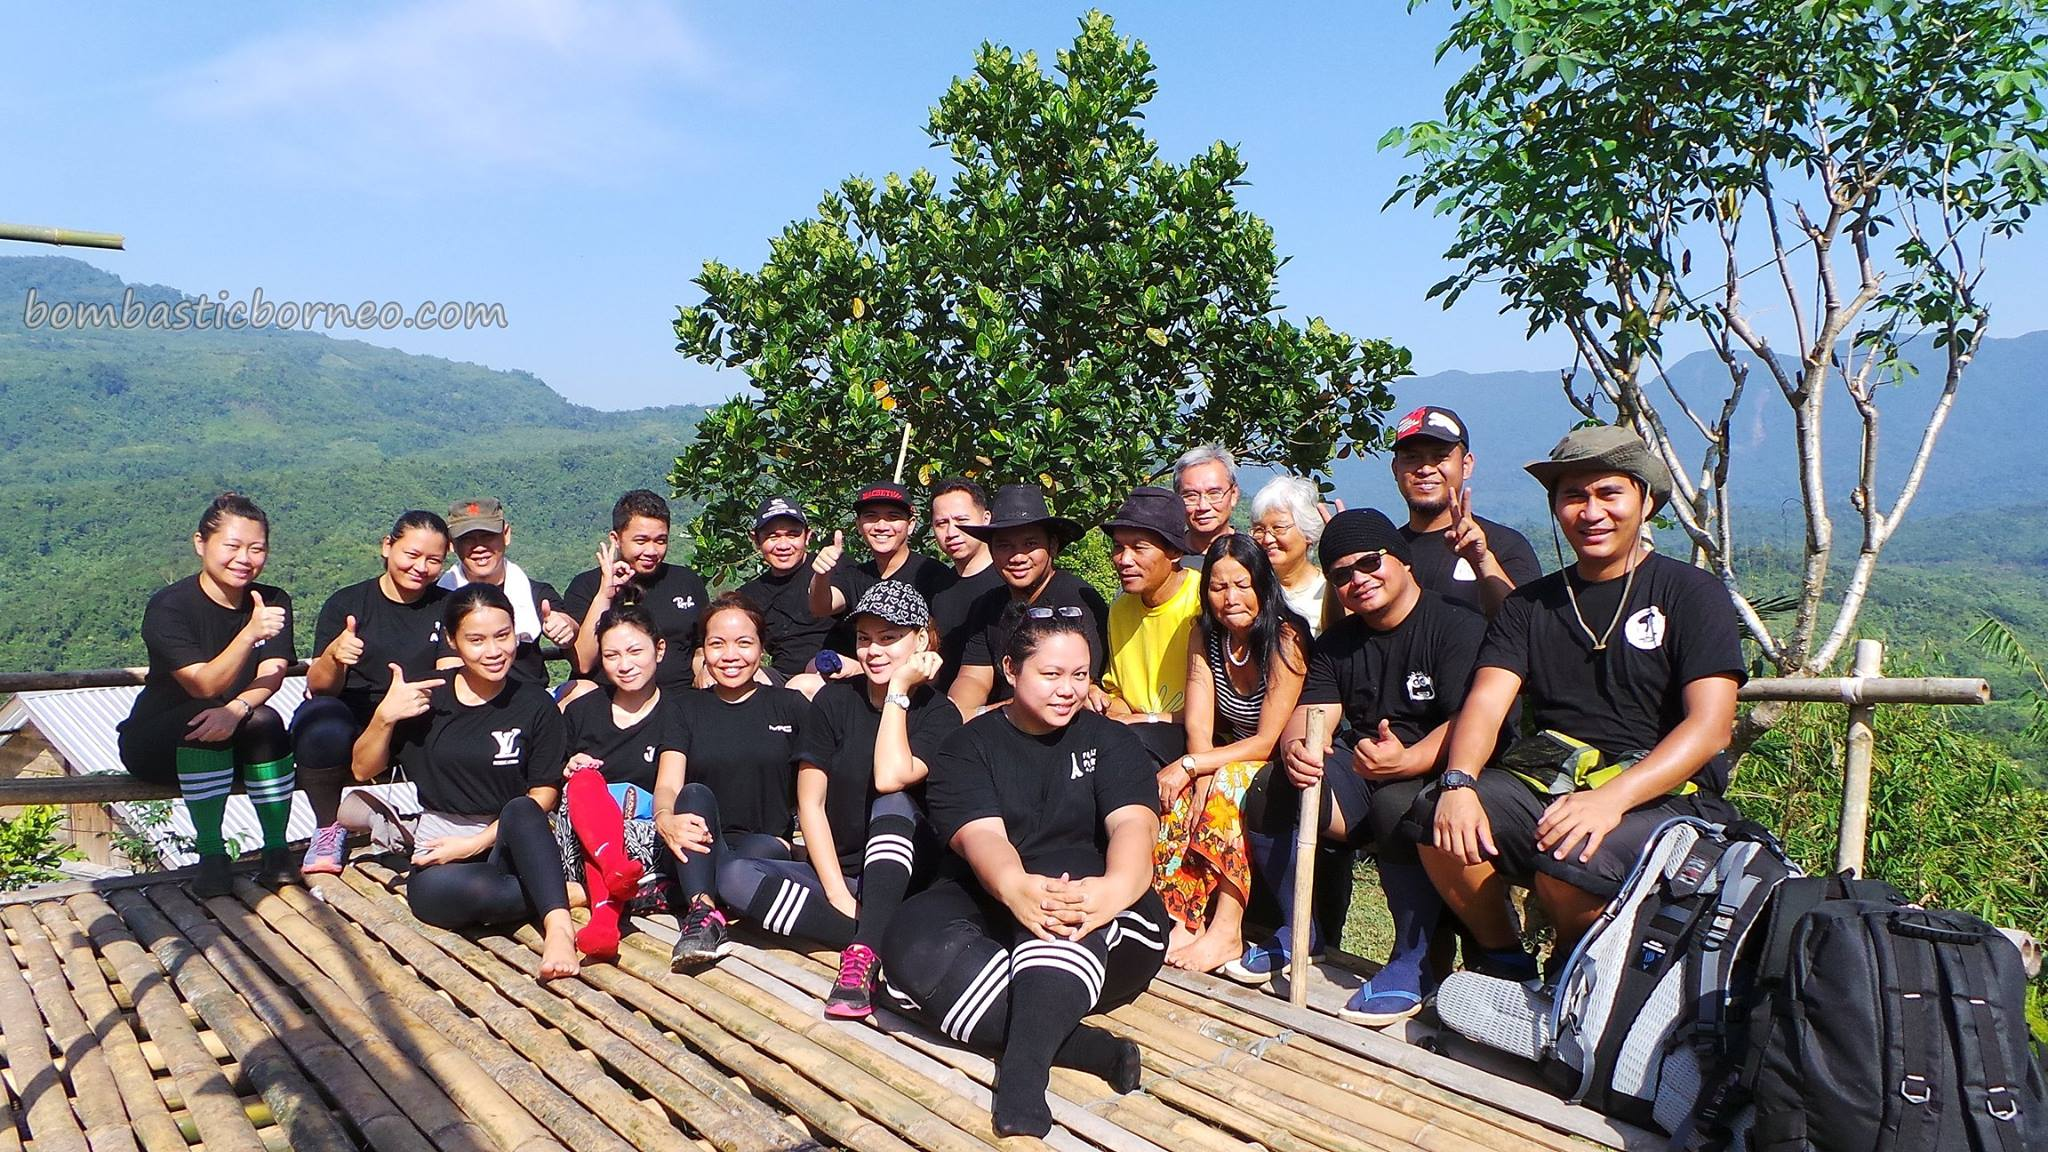 adventure, Ethnic Bidayuh, Highlands, hiking, indigenous, Kuching, land dayak, Malaysia, native, nature, orang asal asli, outdoors, Padawan, rainforest, trekking, tribal, tribe, Waterfall,